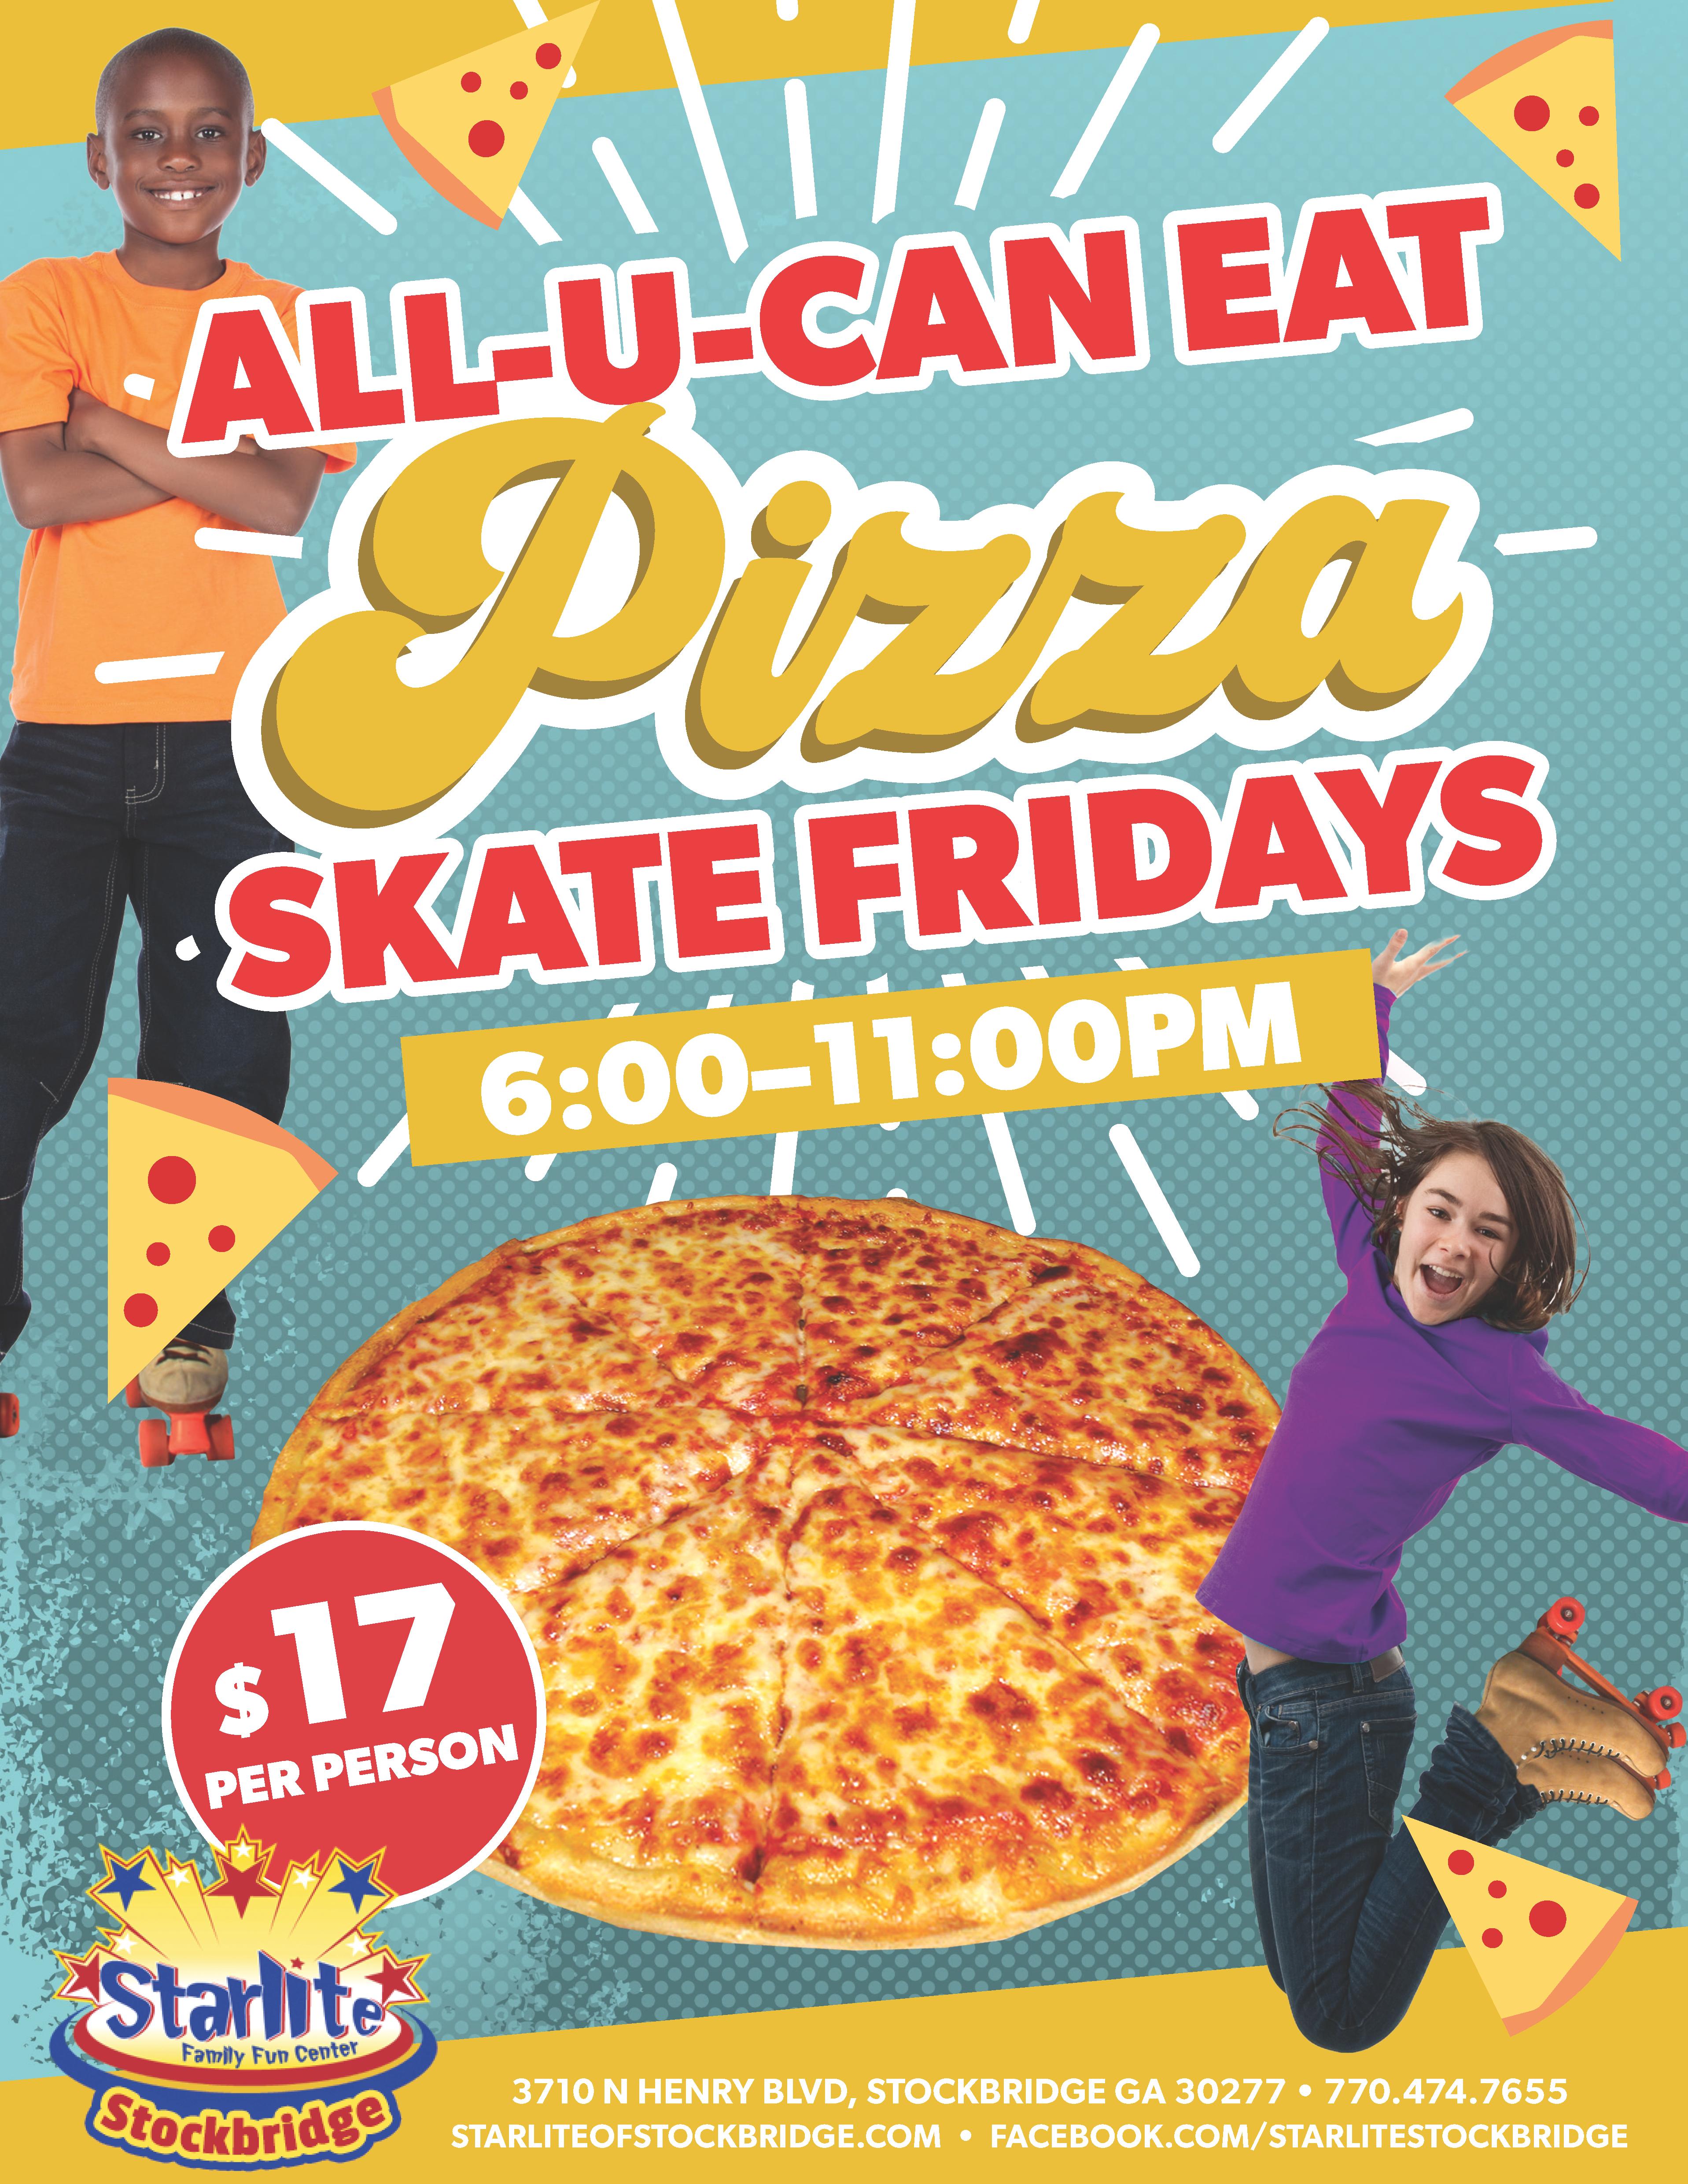 GA21-010 All You Can Eat Pizza Flyer-Stockbridge new